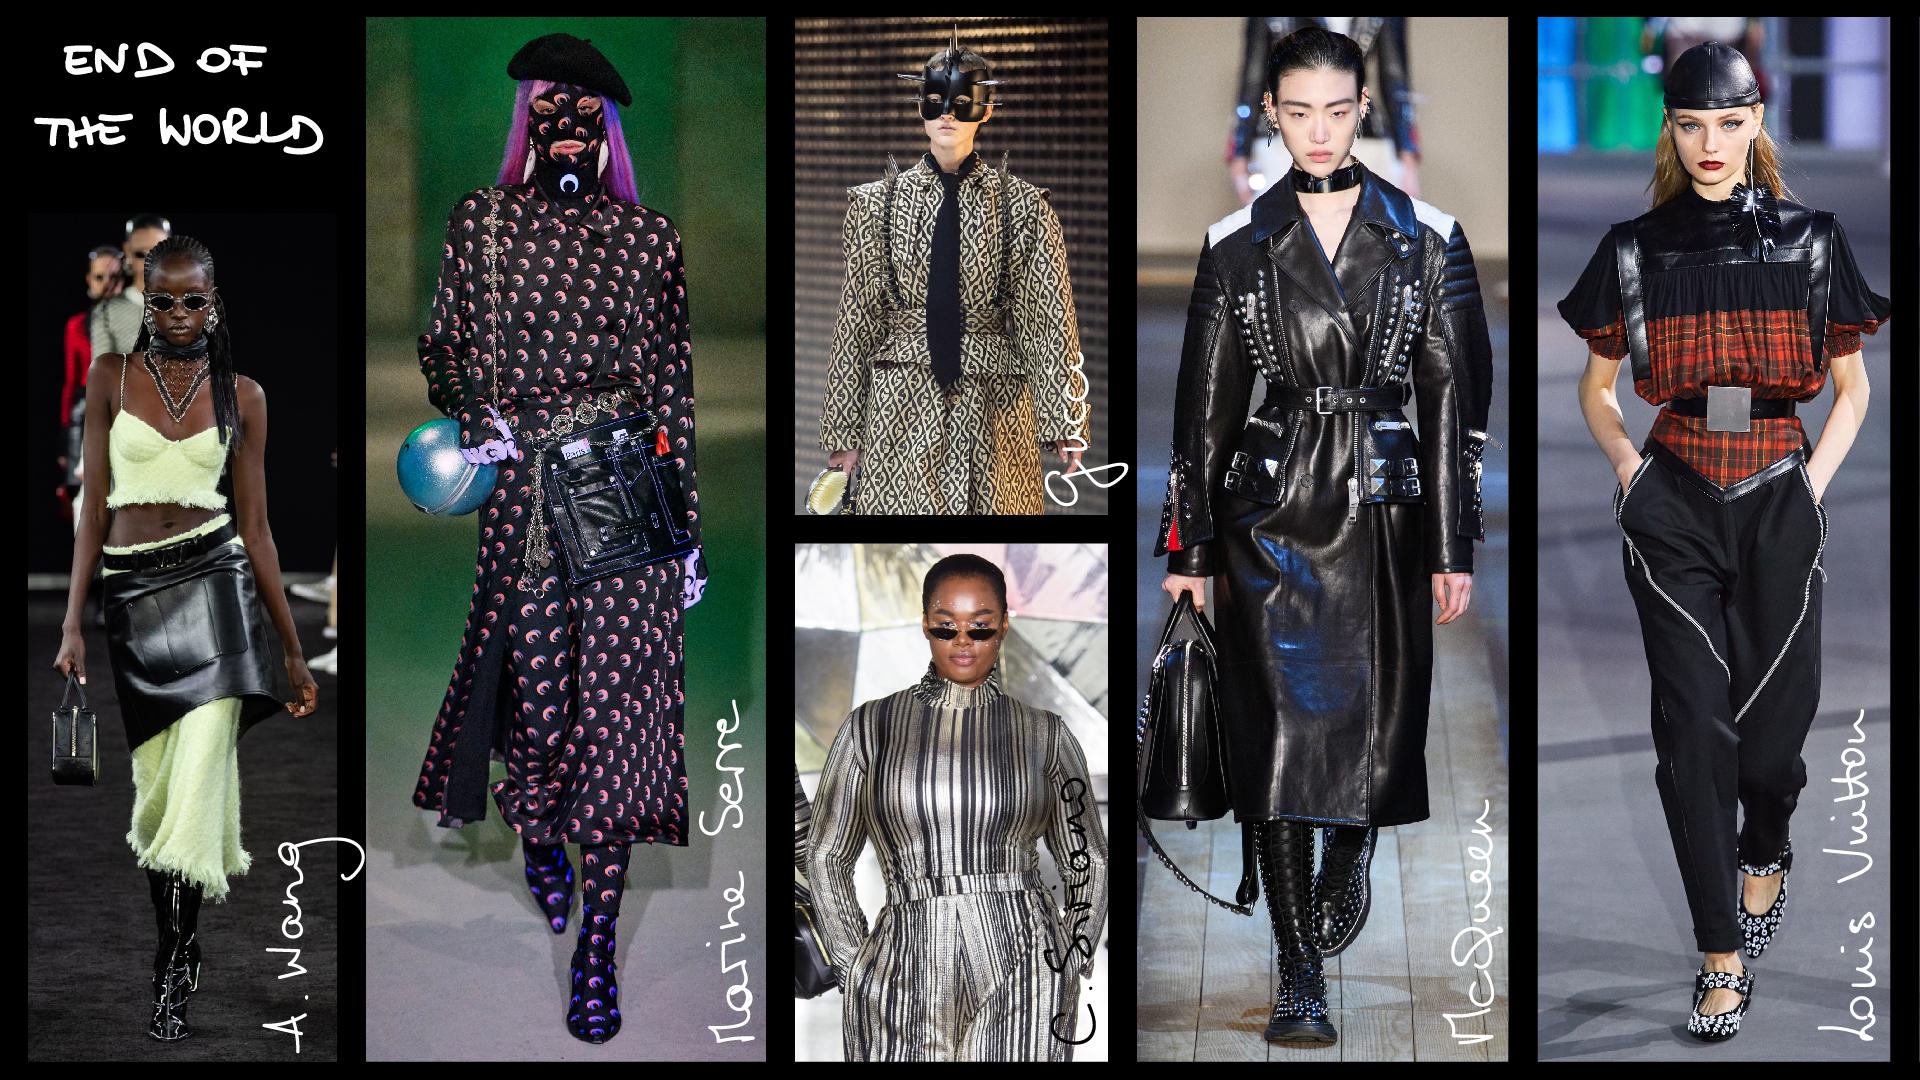 Justine-Leconte_fashion-trends-fall-winter-2019_boards-06.jpg